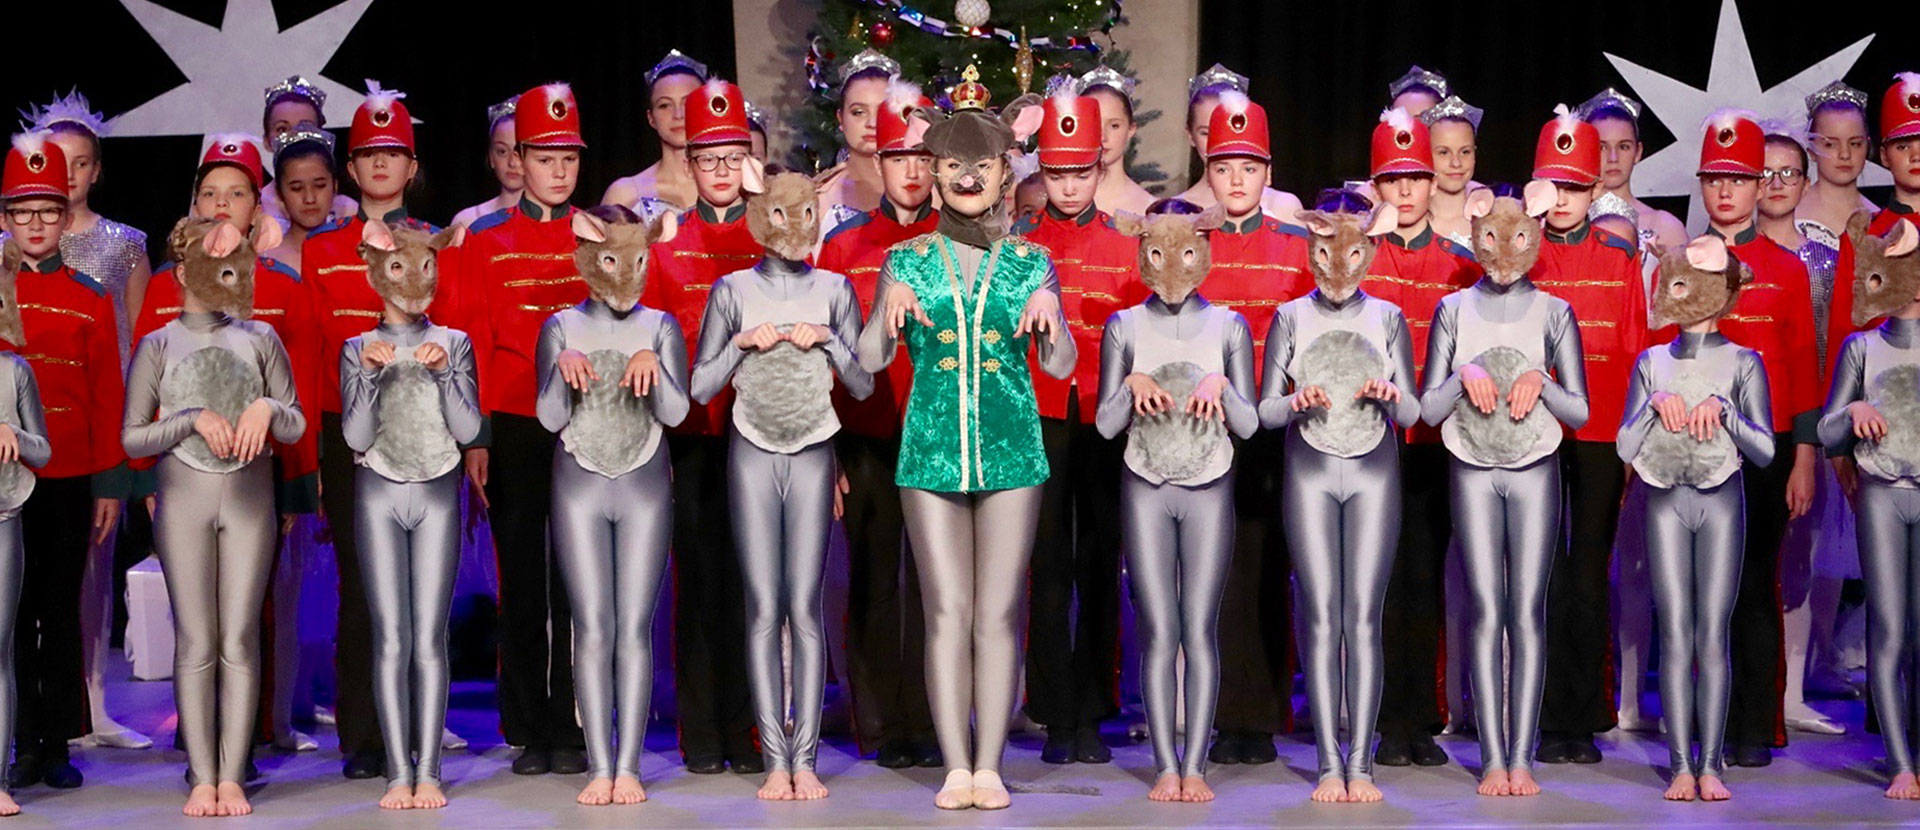 Nutcracker Modern Dance Production